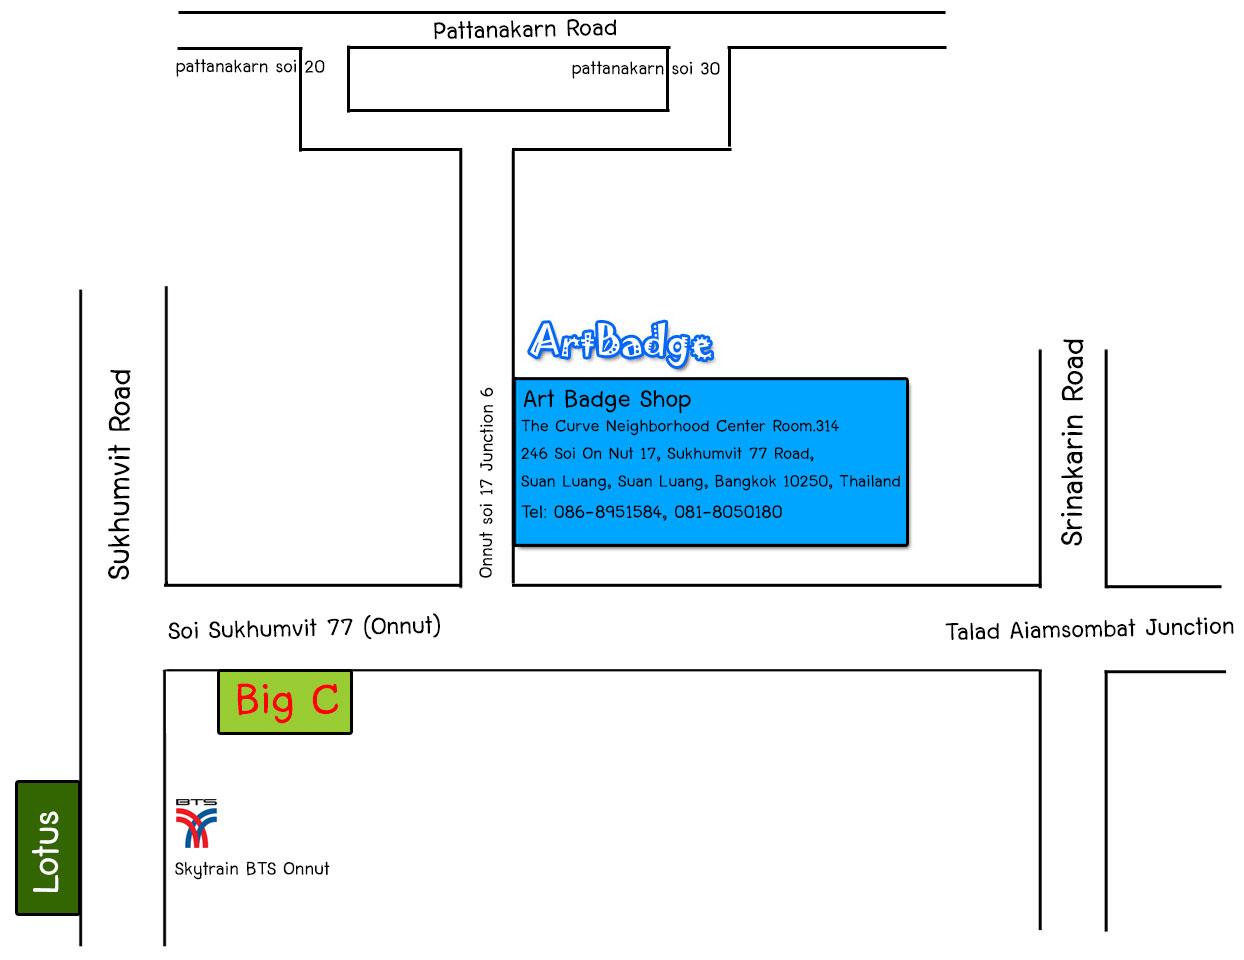 Artbadge Map